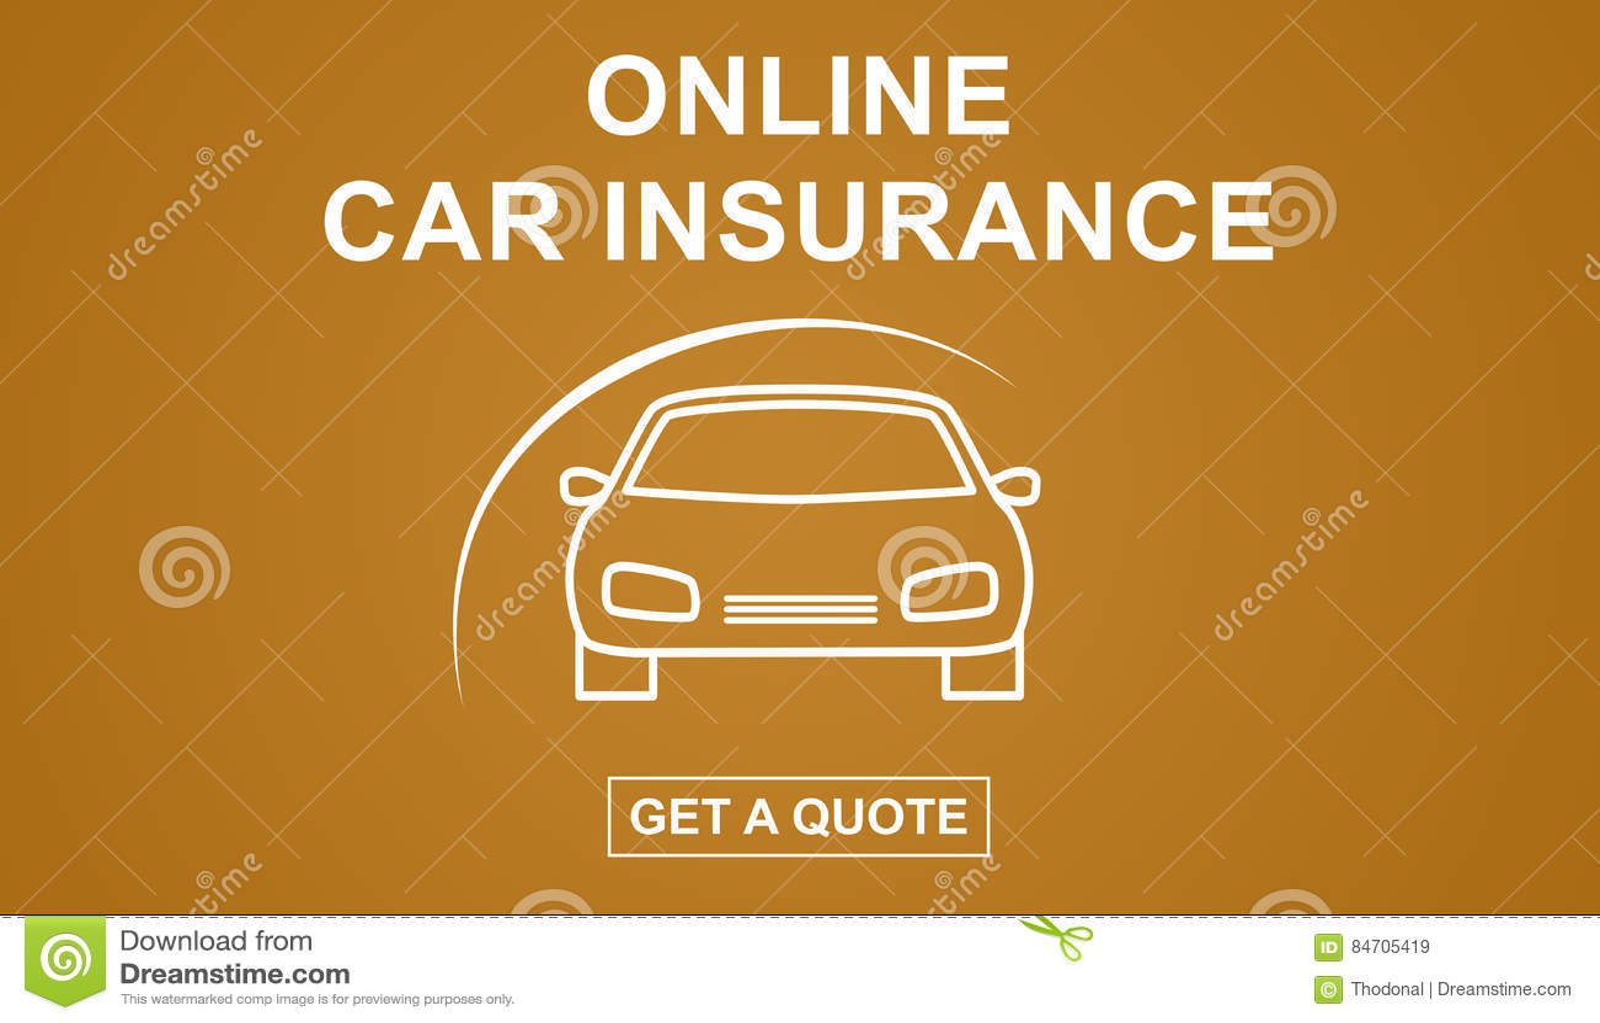 Online Car Insurance >> Online Car Insurance Concept Stock Illustration